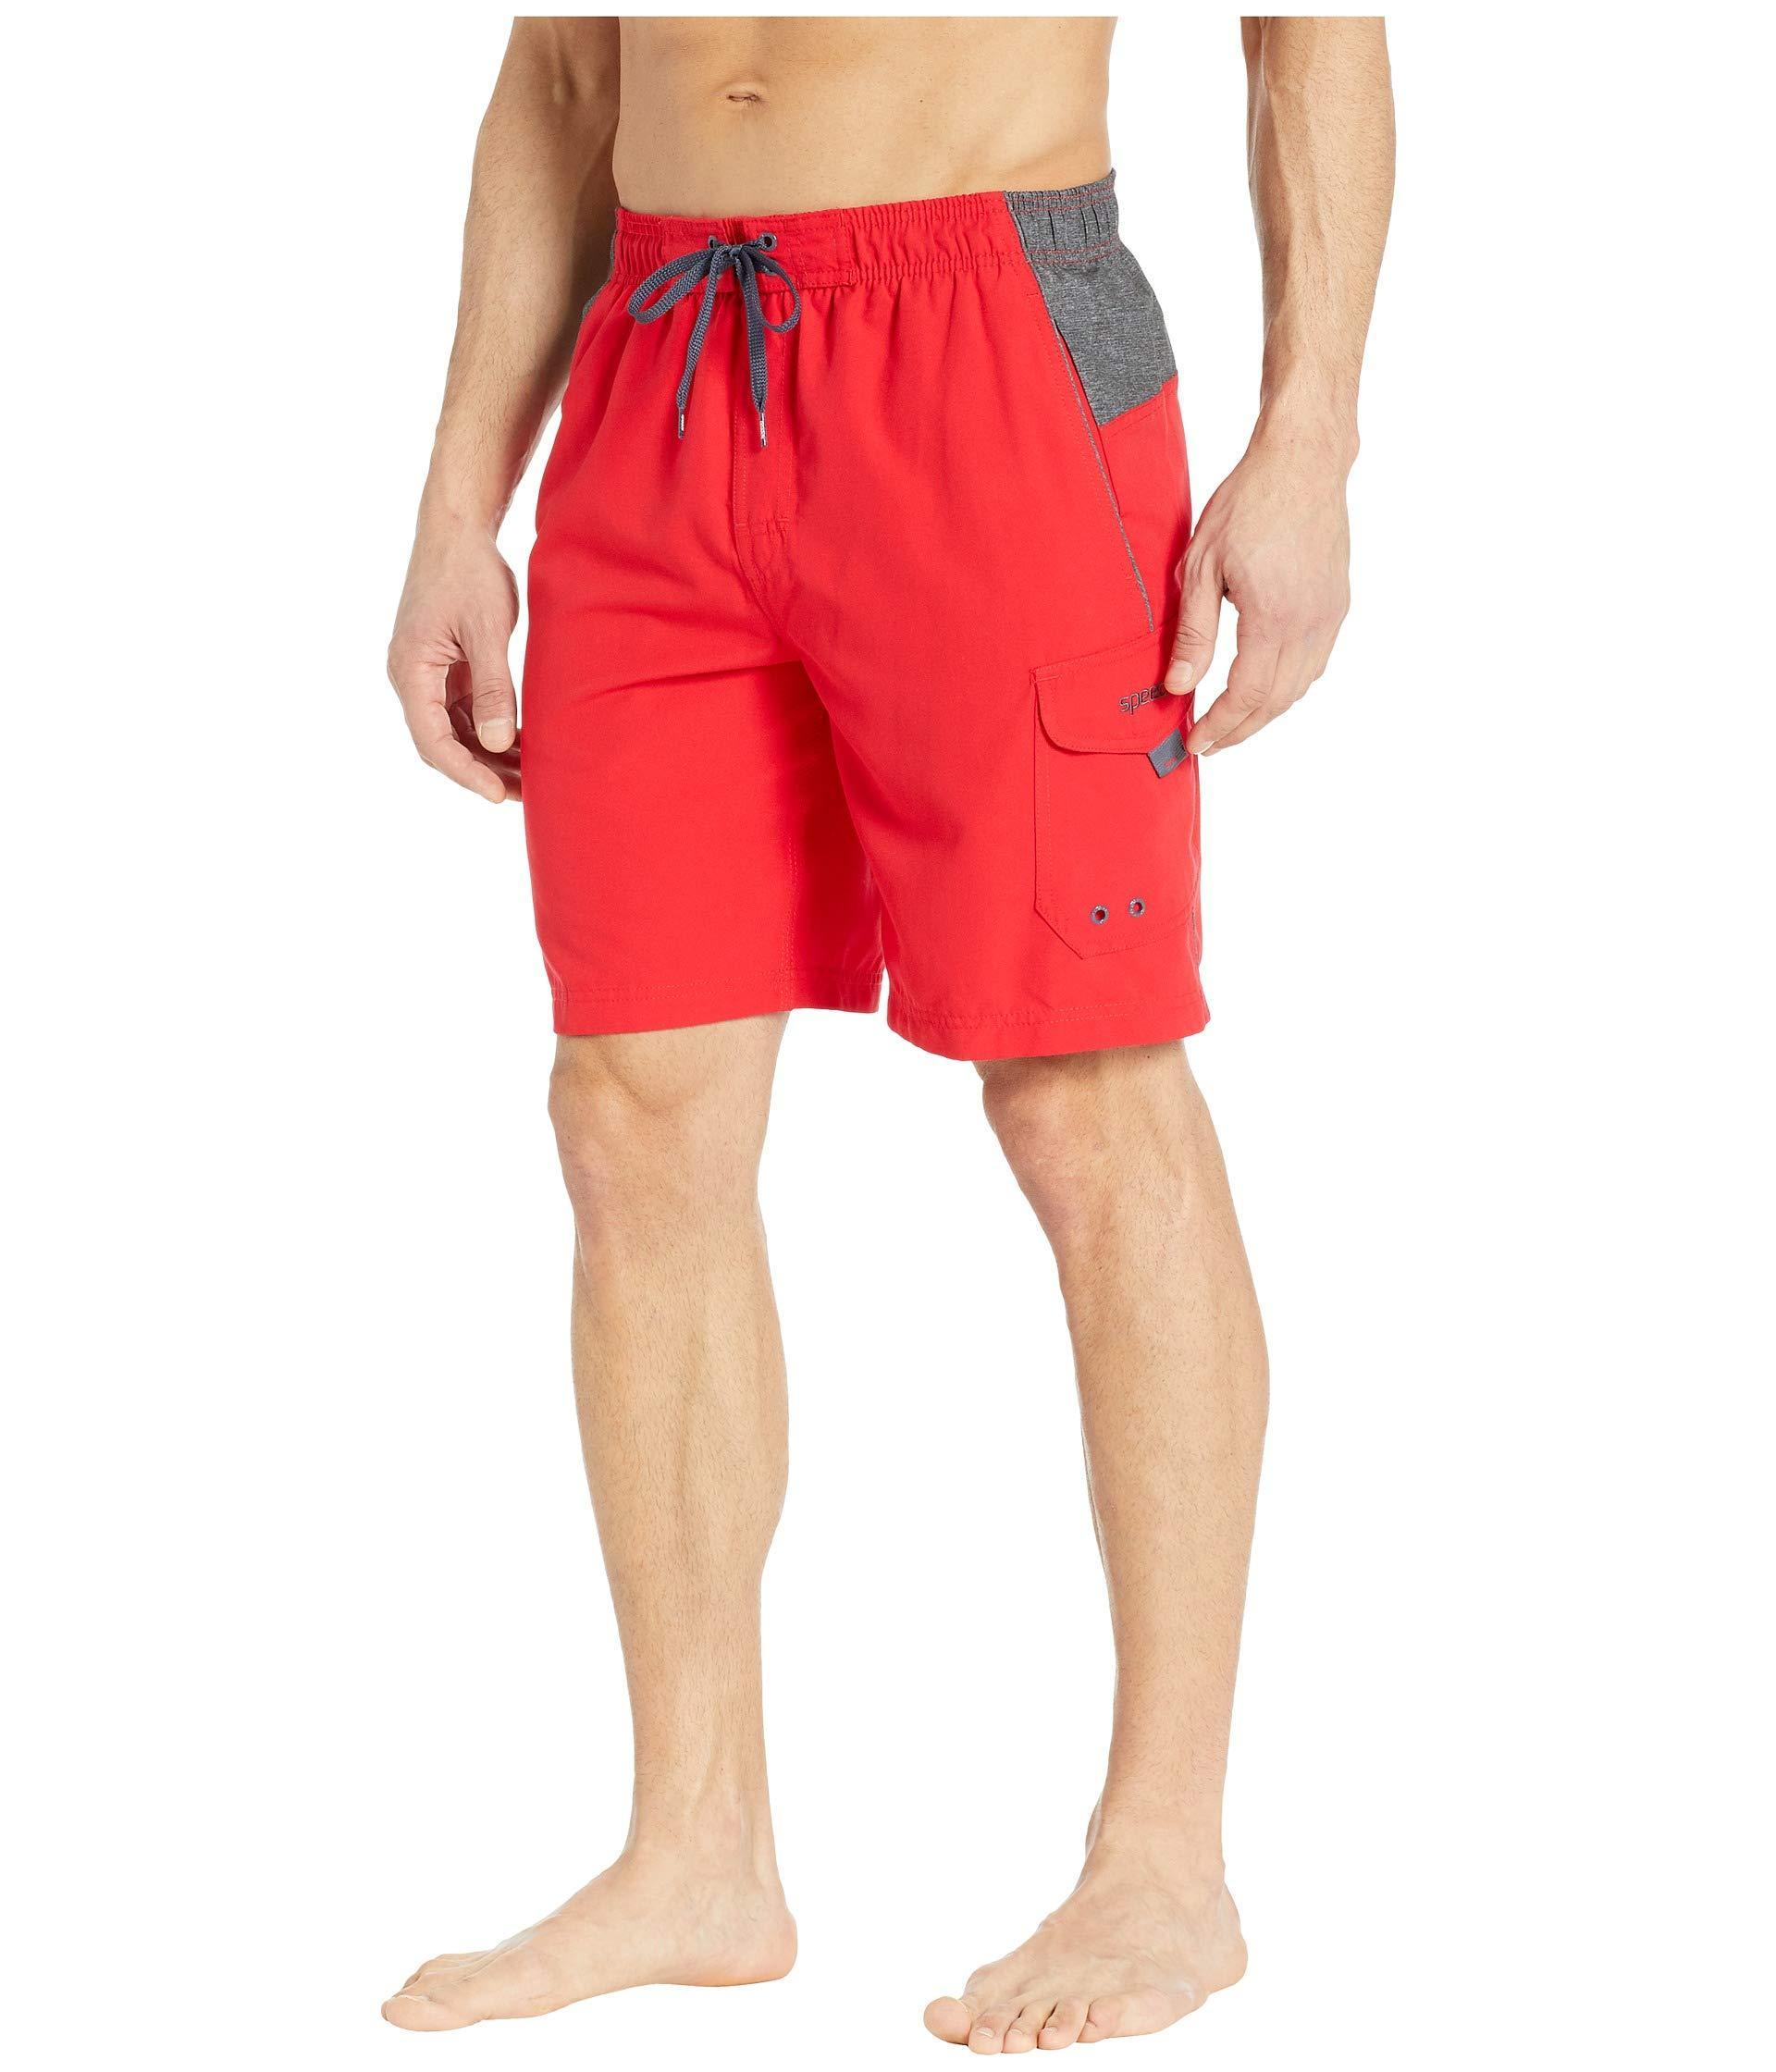 cadad10bae Lyst - Speedo Sport Volley ( Navy) Men's Swimwear in Red for Men